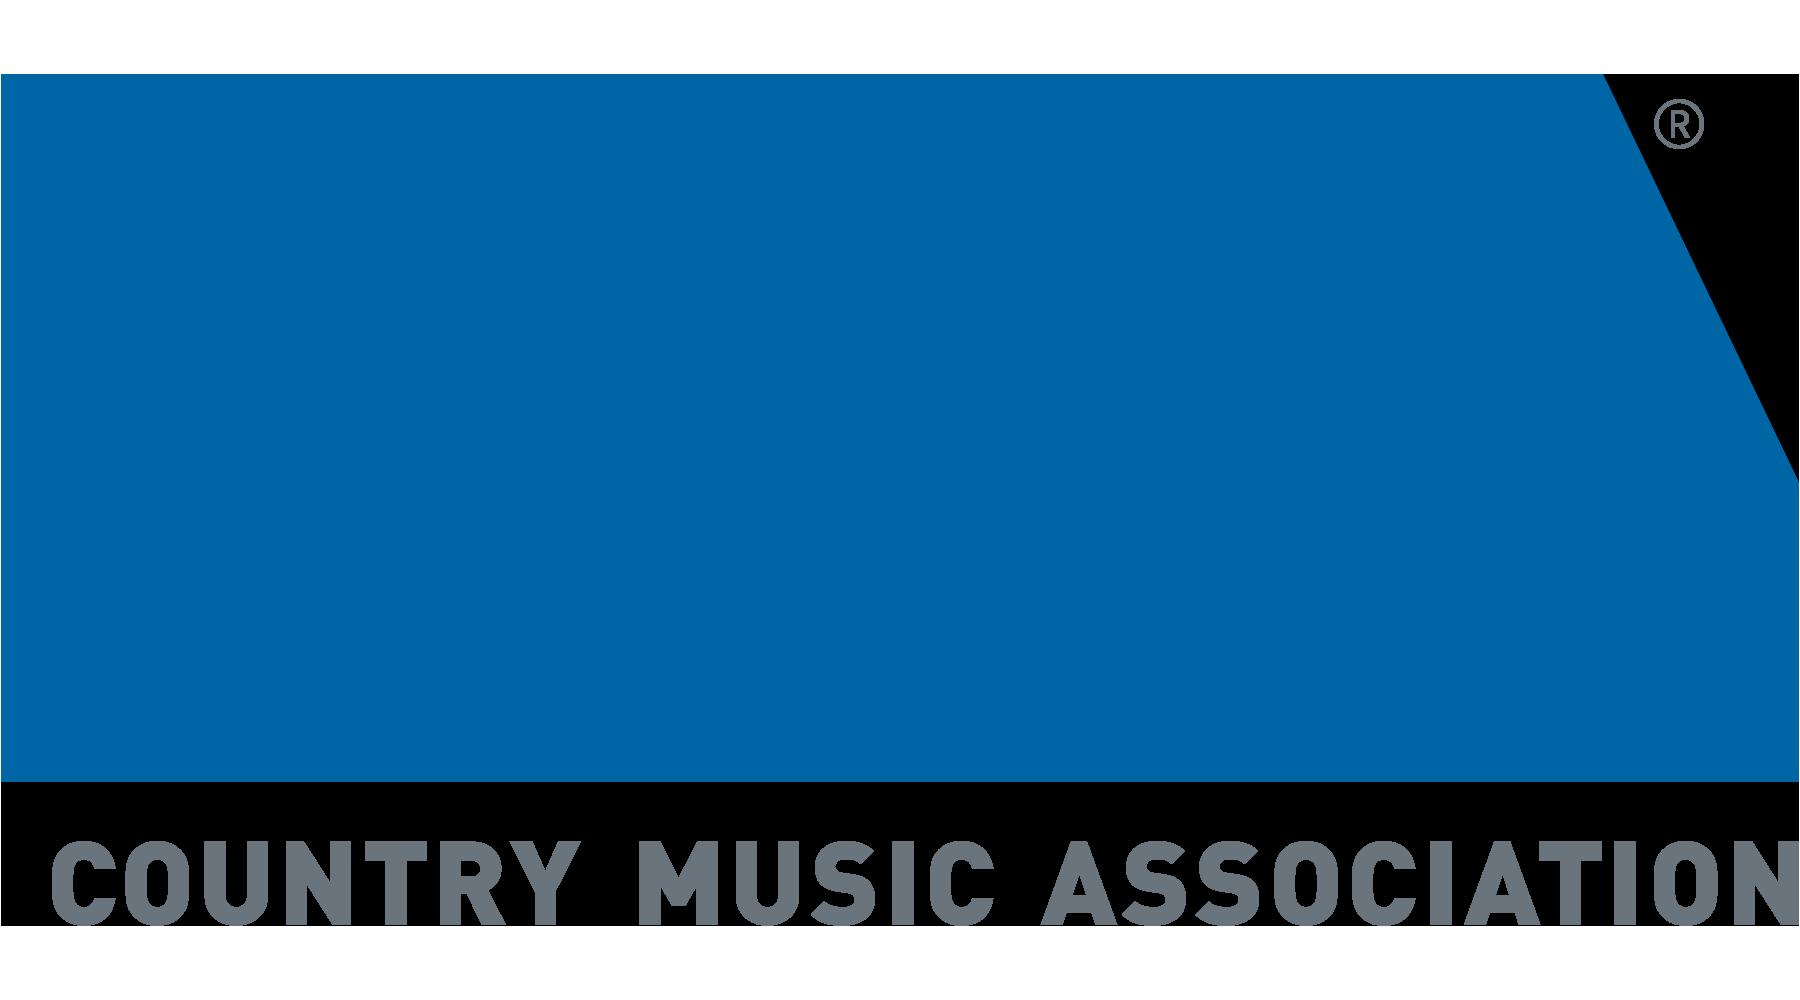 Country Music Association Logo